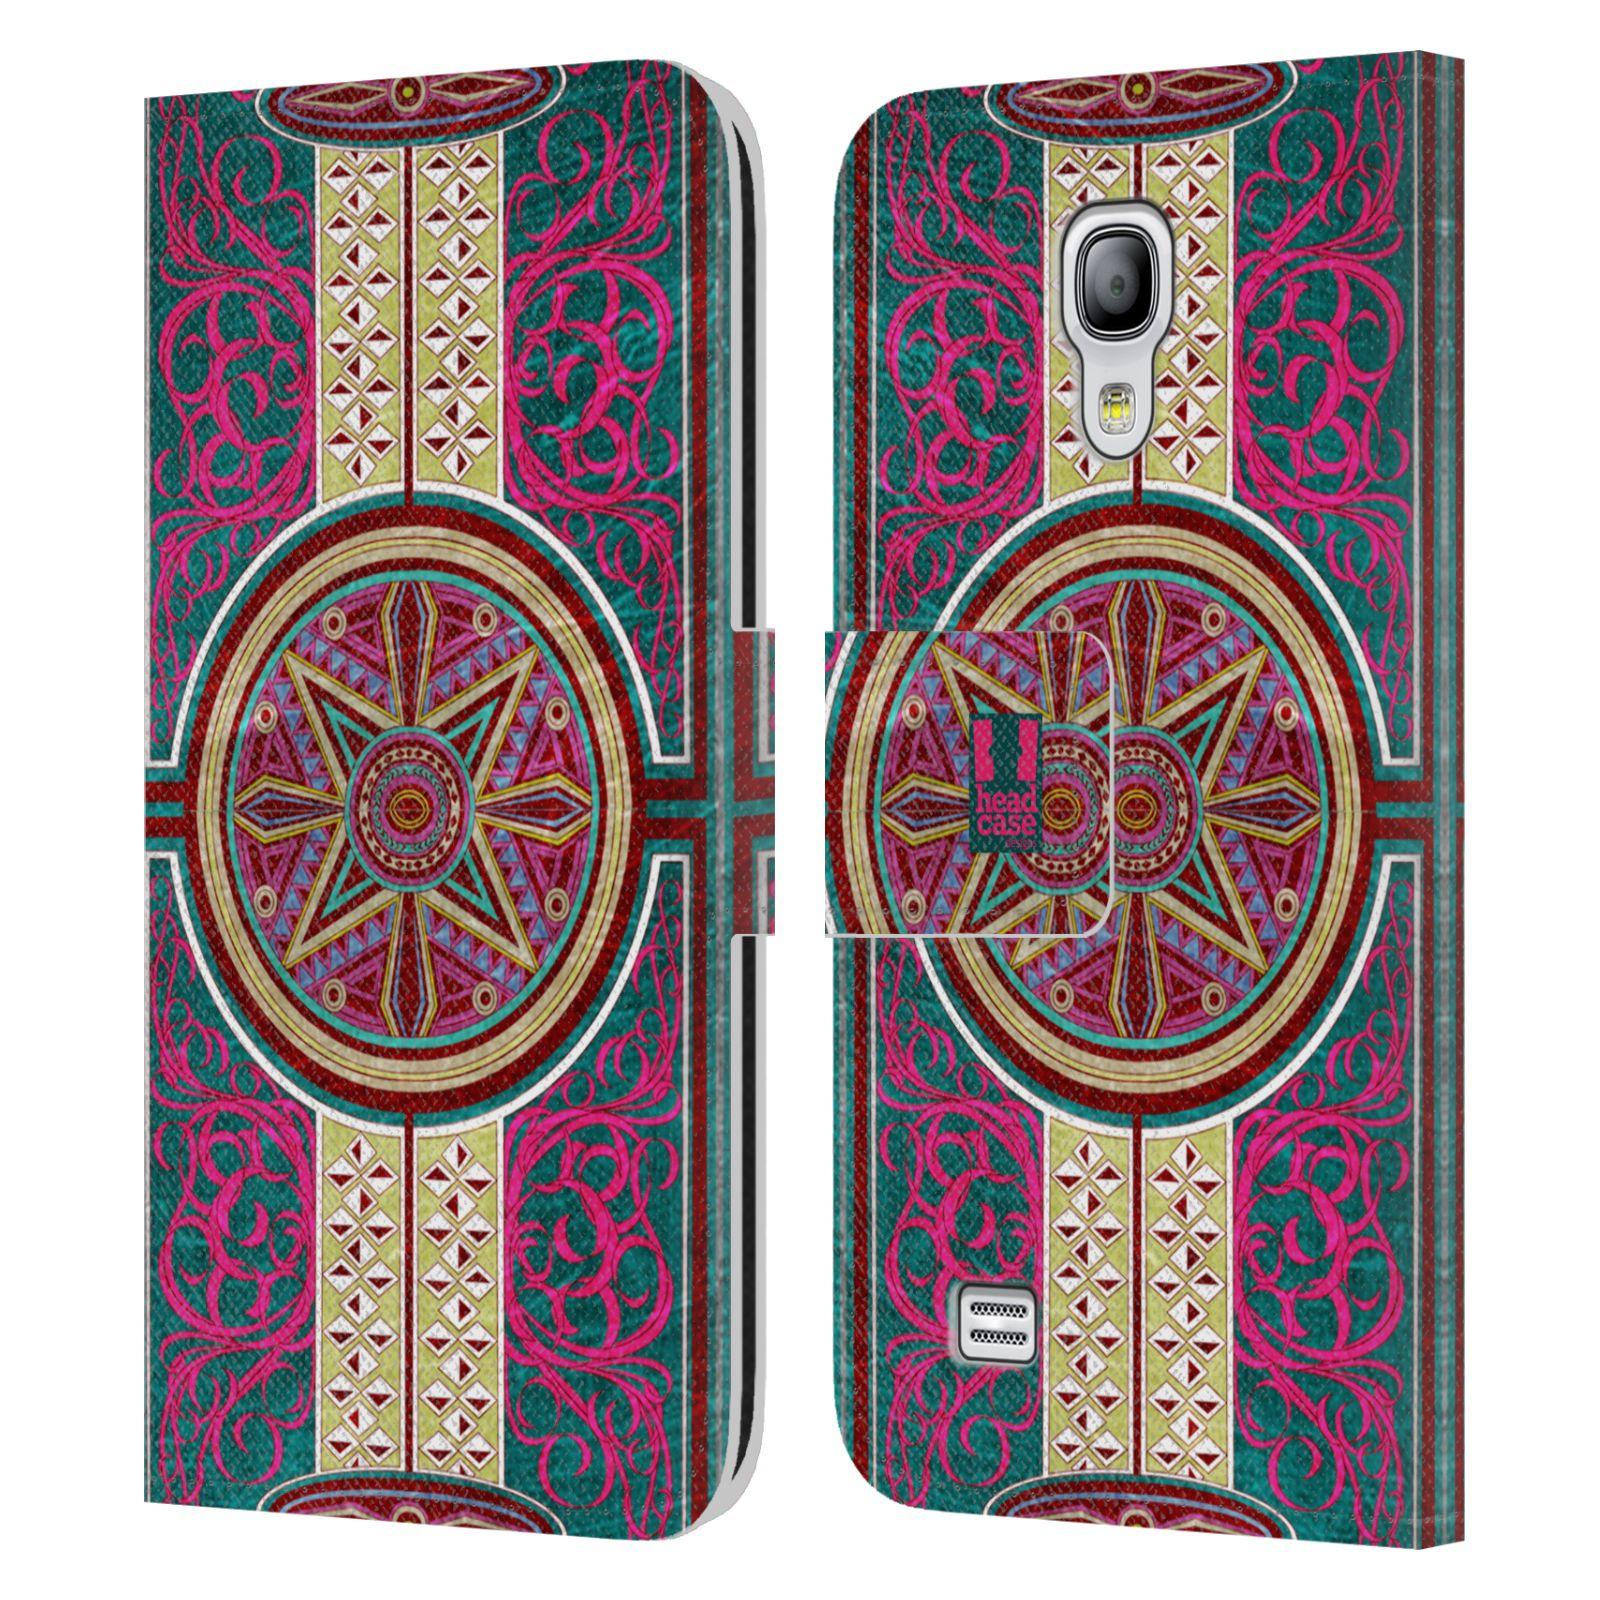 HEAD CASE Flipové pouzdro pro mobil Samsung Galaxy S4 MINI / S4 MINI DUOS ARABESKA Baroko rudá kruh